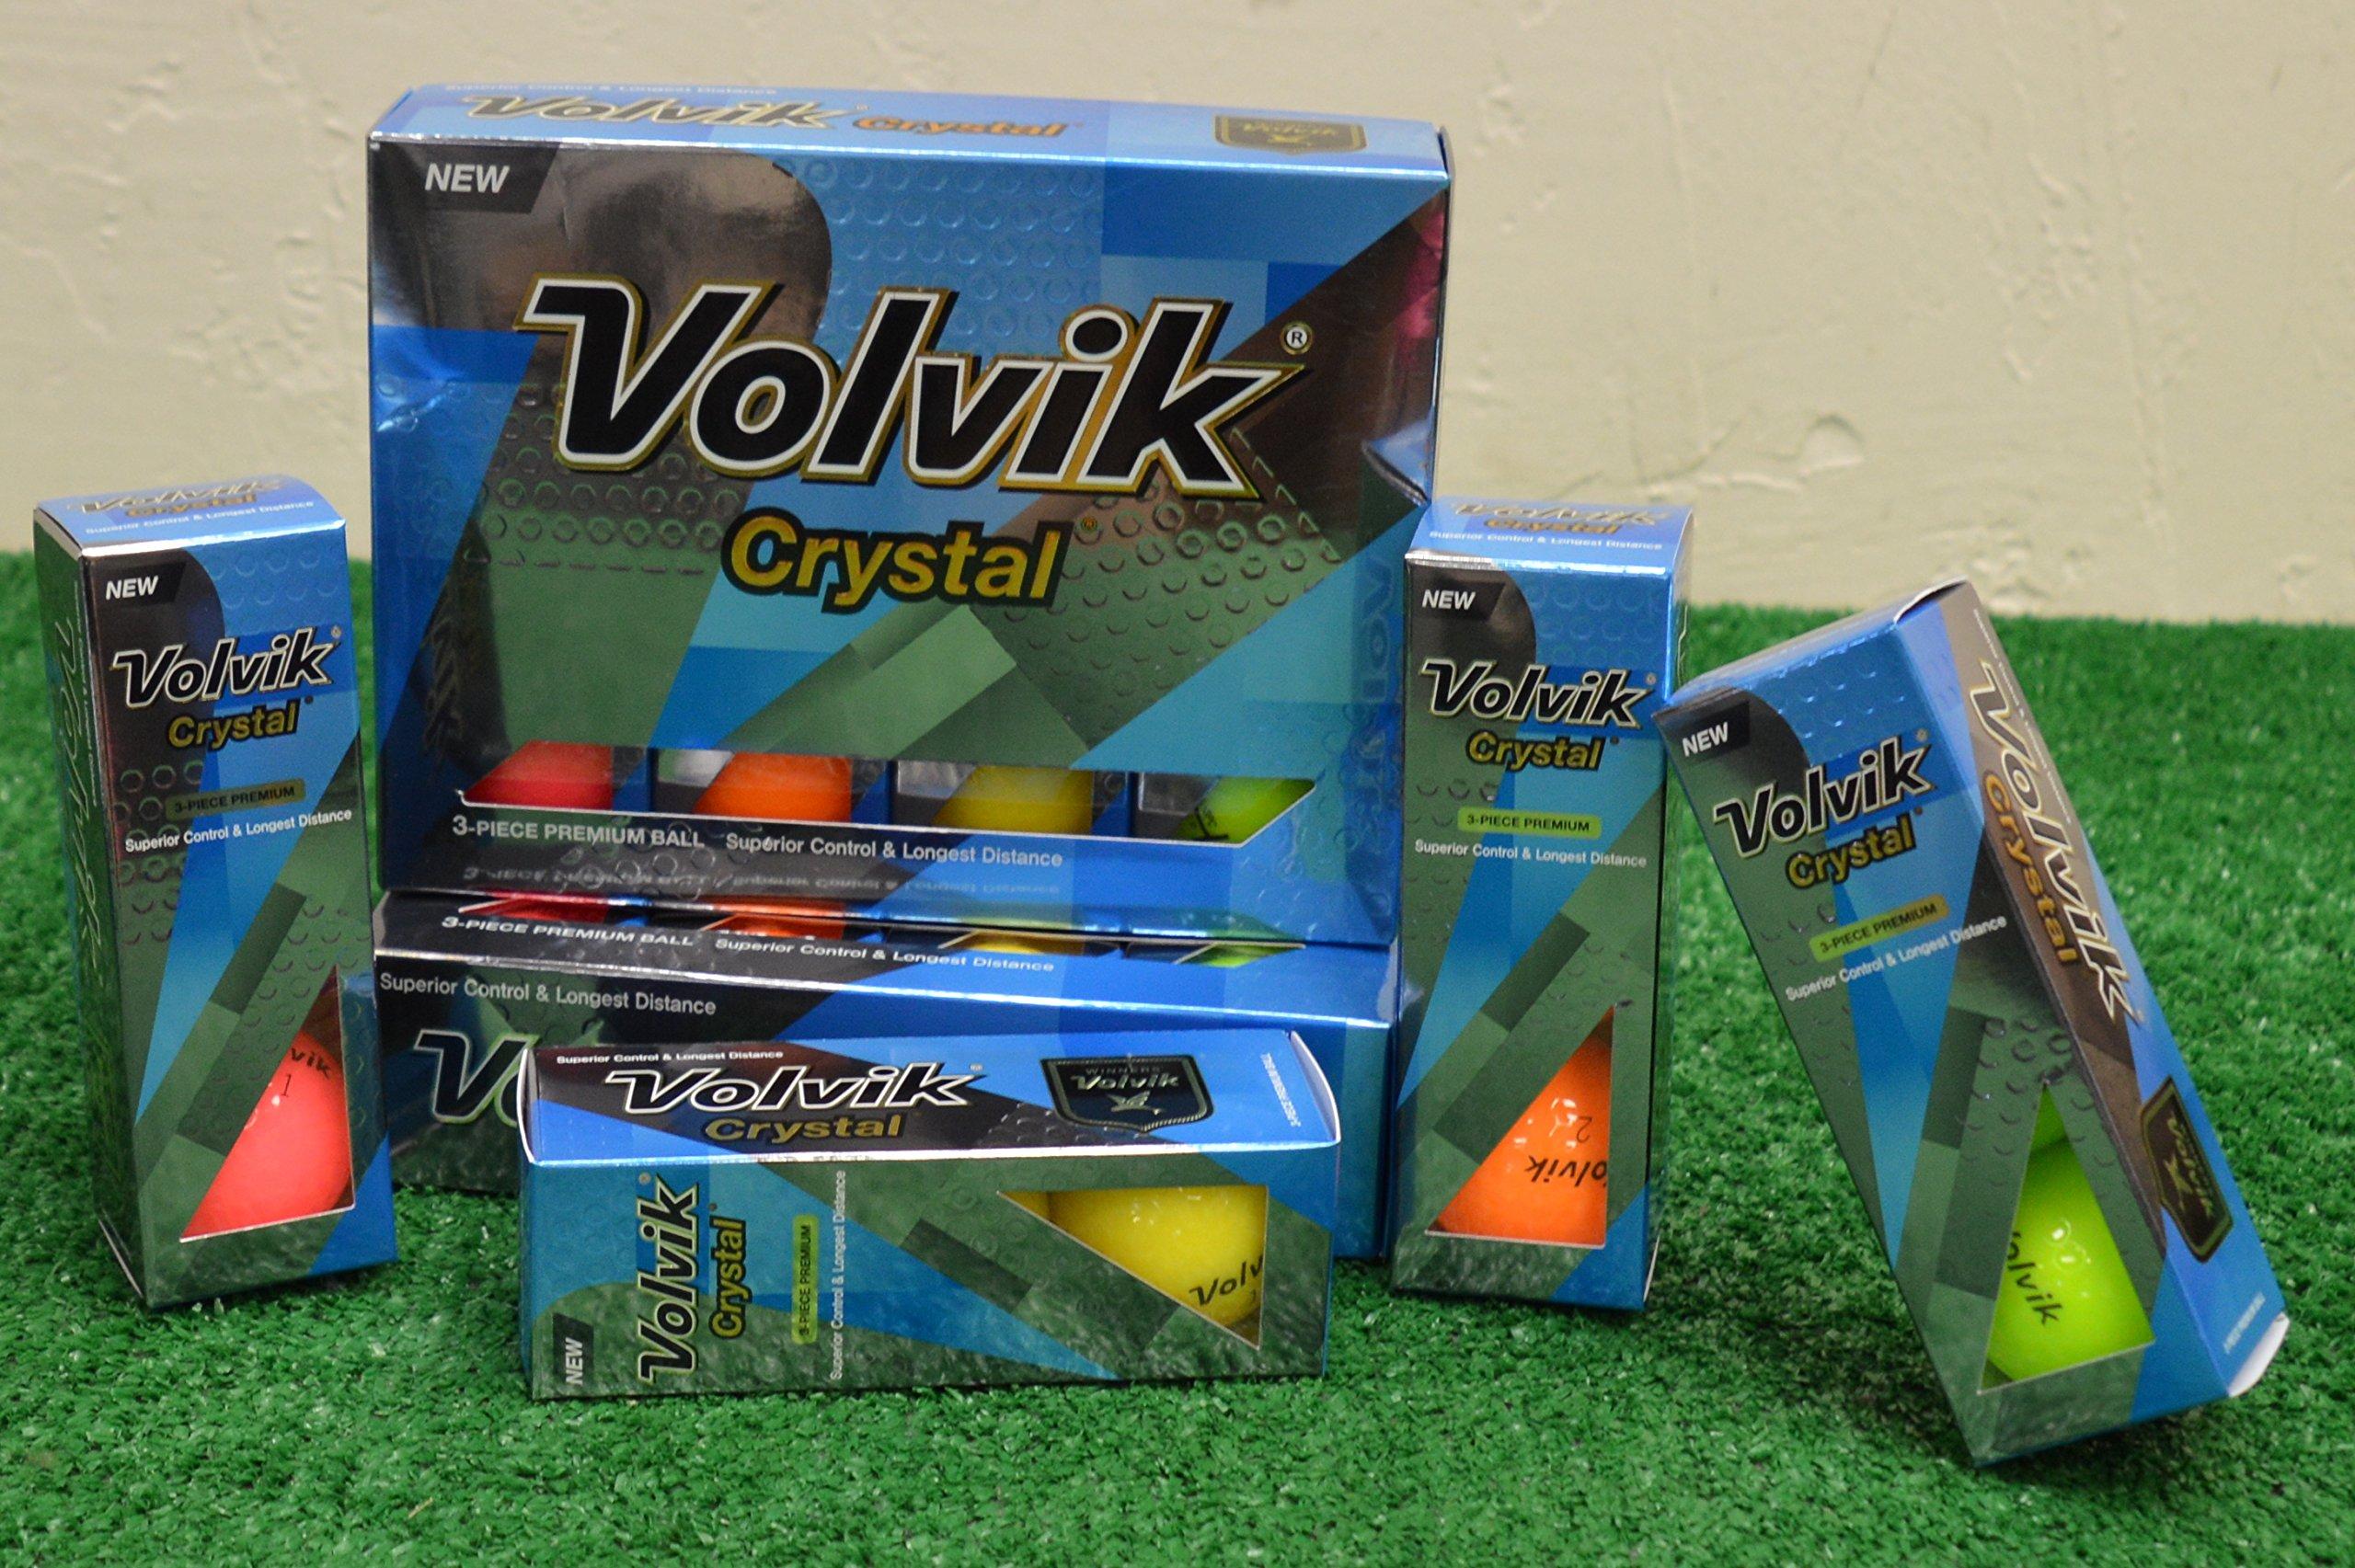 3 Dozen Volvik Crystal Mixed Color Golf Balls - New in Box